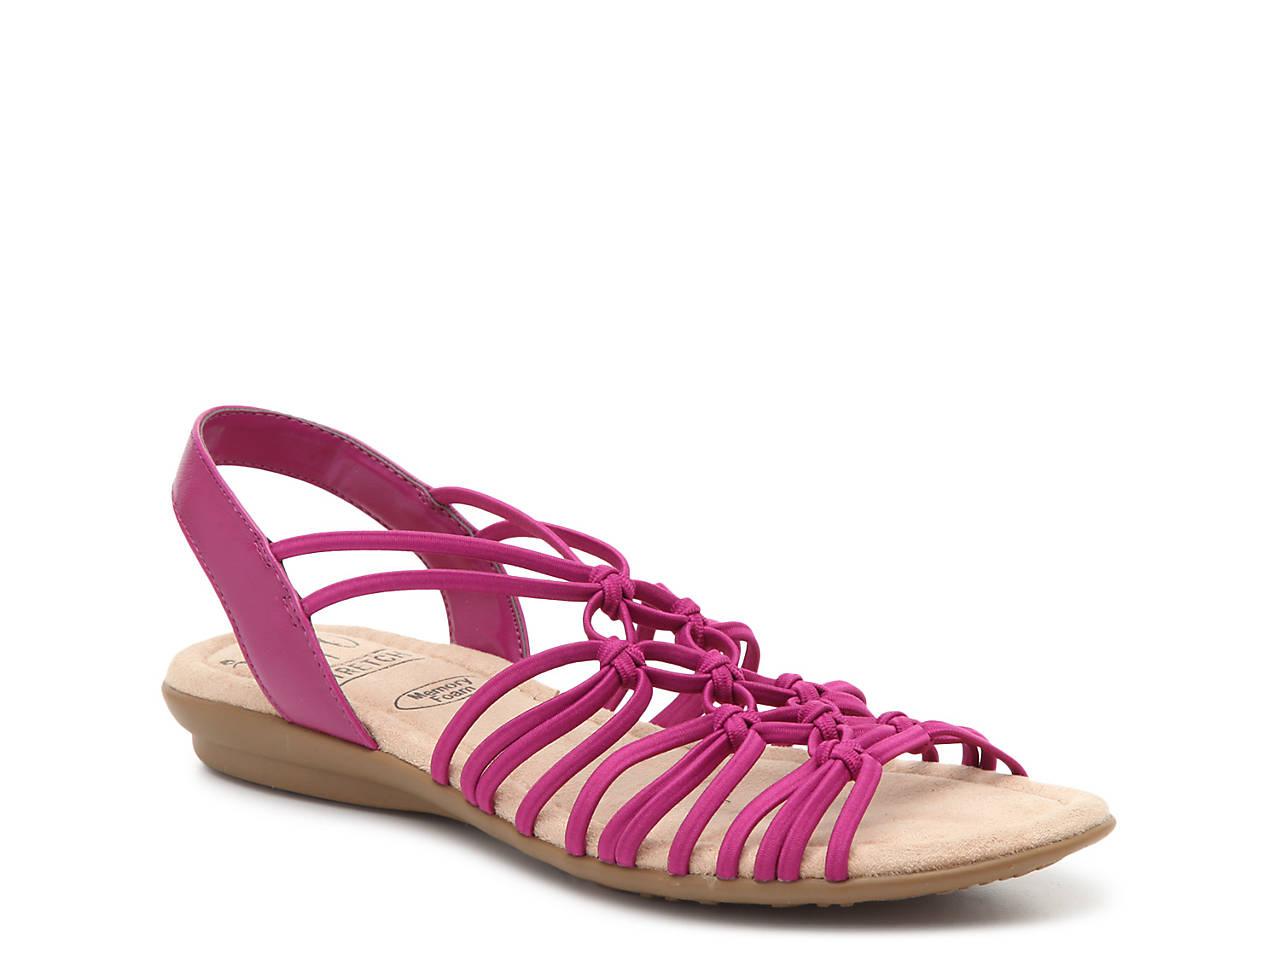 792bef8e24f3 Impo Brandy Wedge Sandal Women s Shoes